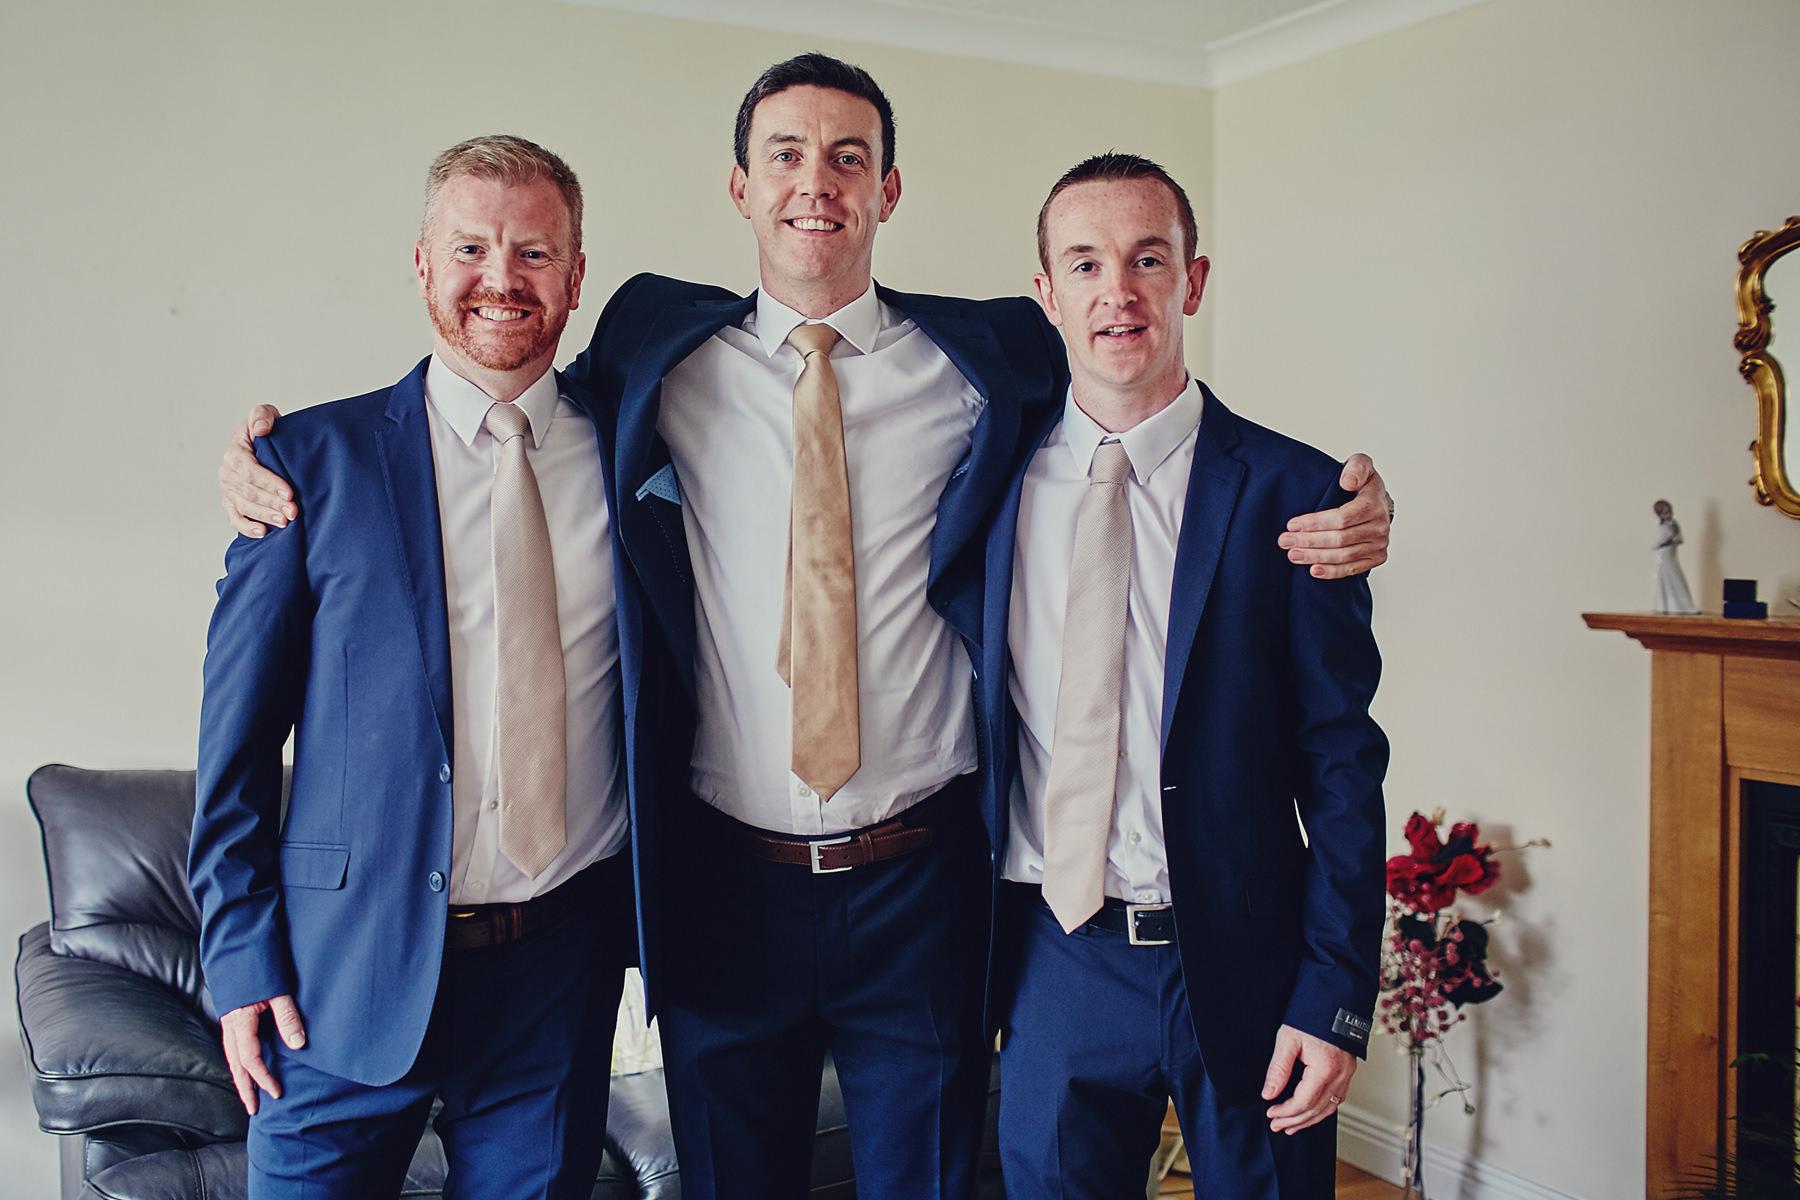 Dunboyne Castle wedding | Emily & David 19